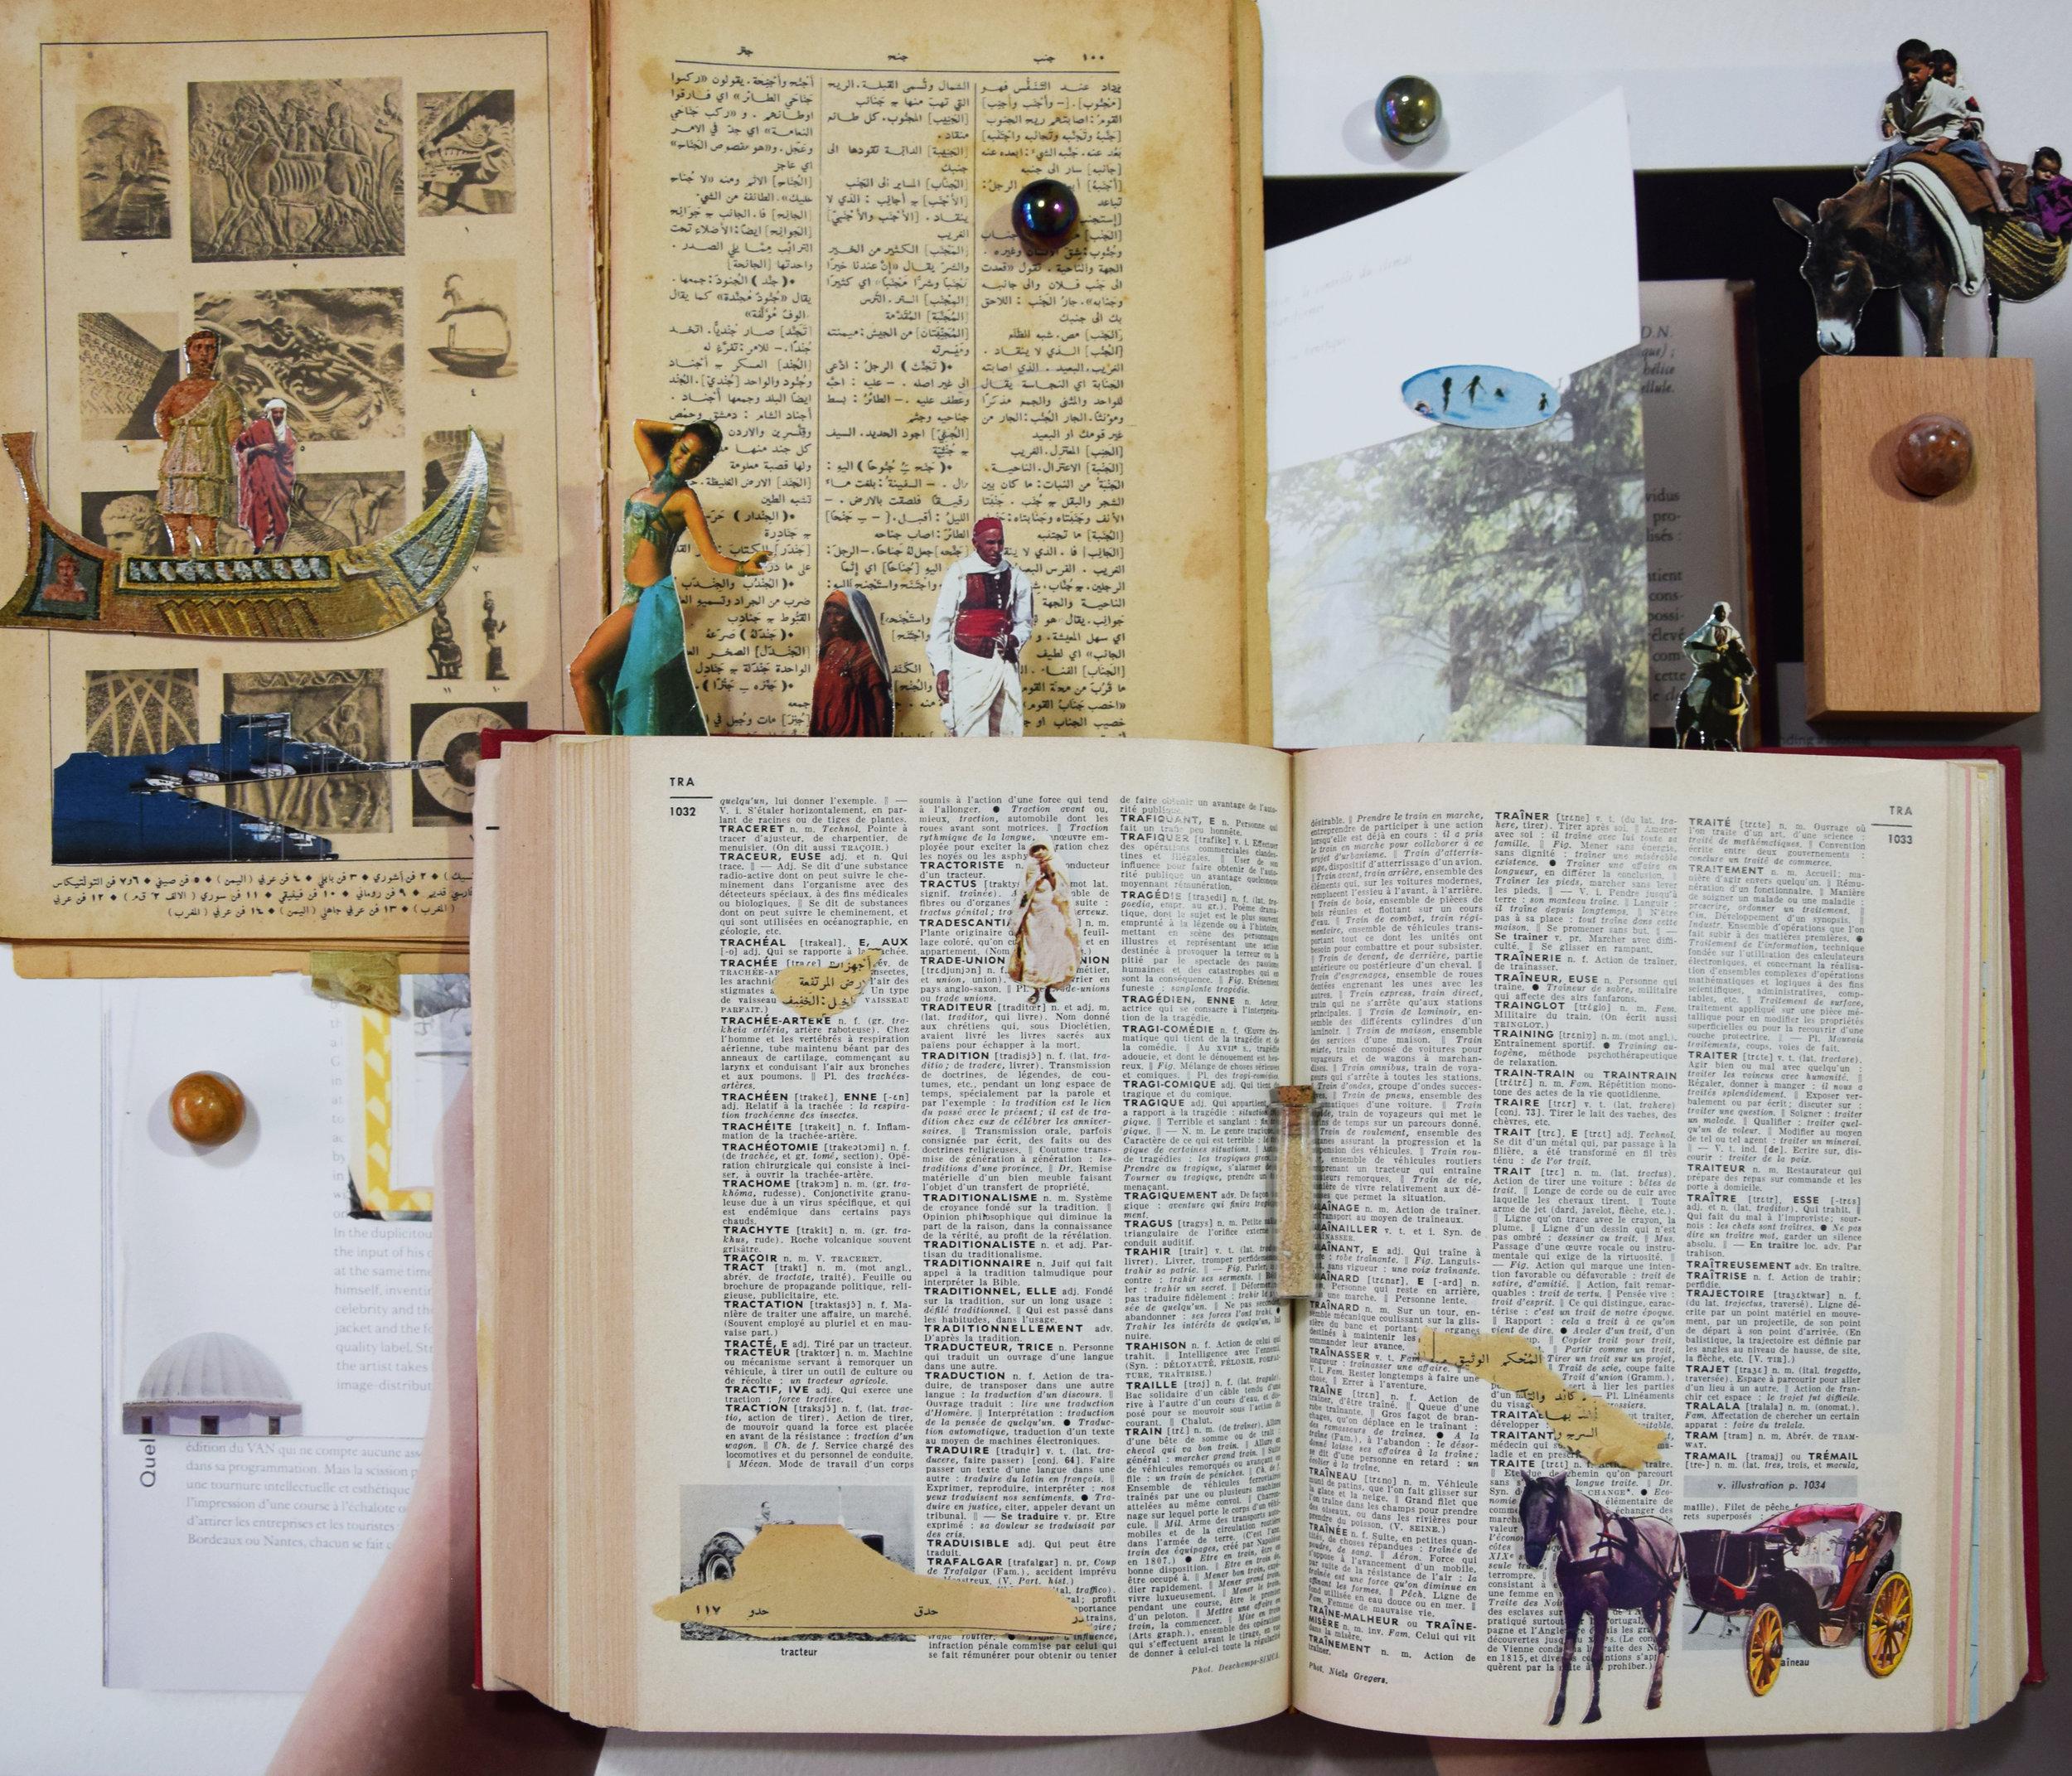 Farah Khelil,  The landscape is not a bookmark , (2019), image courtesy of Rebecca Fanuele.